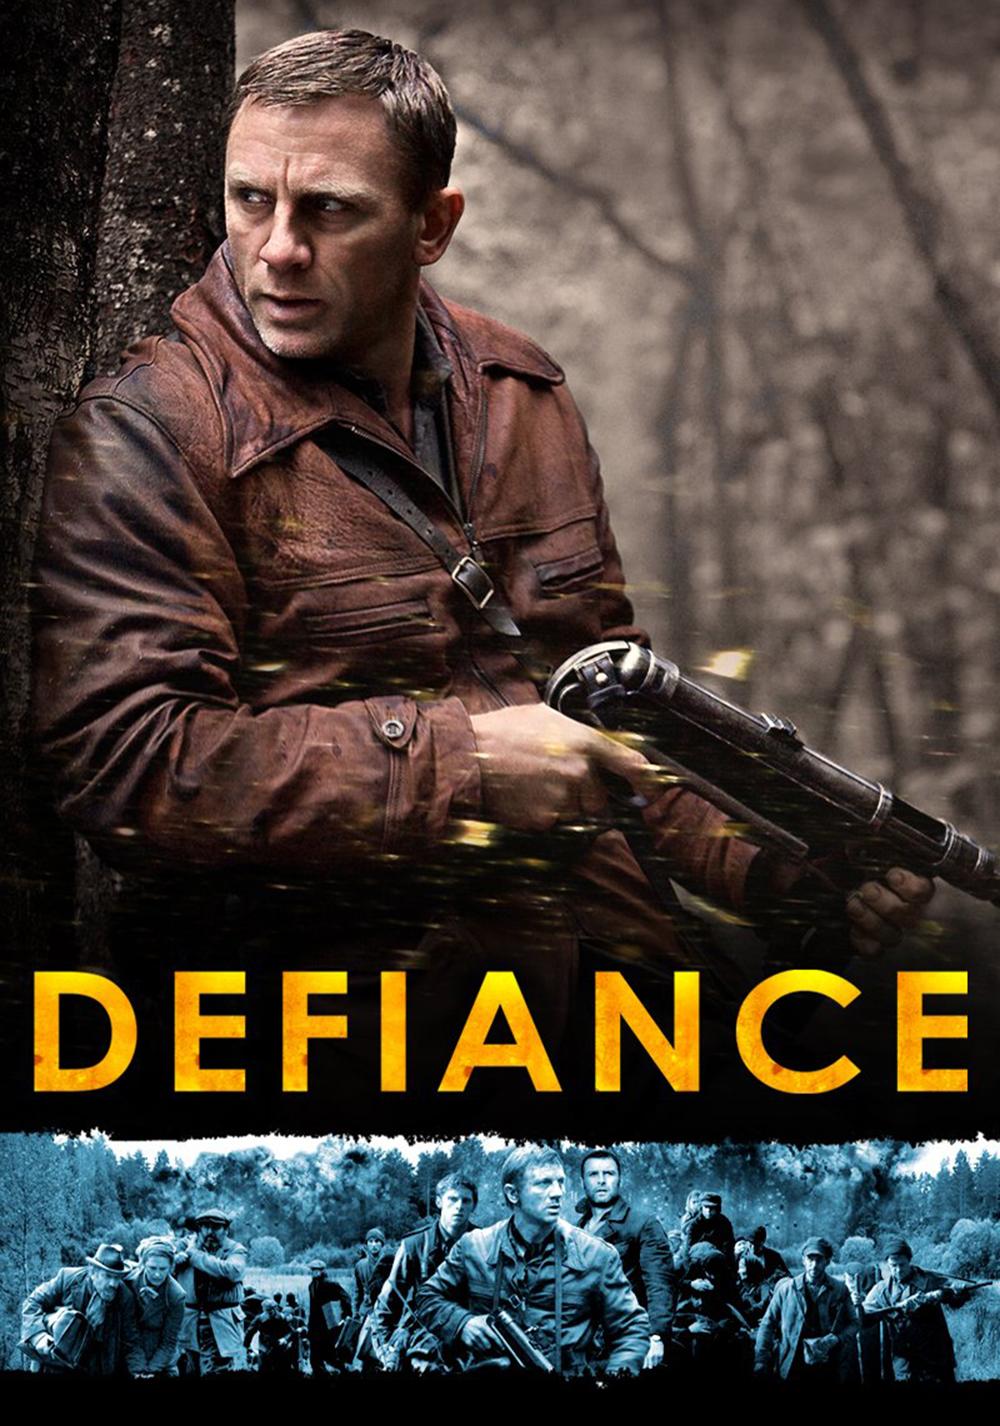 Defiance Film